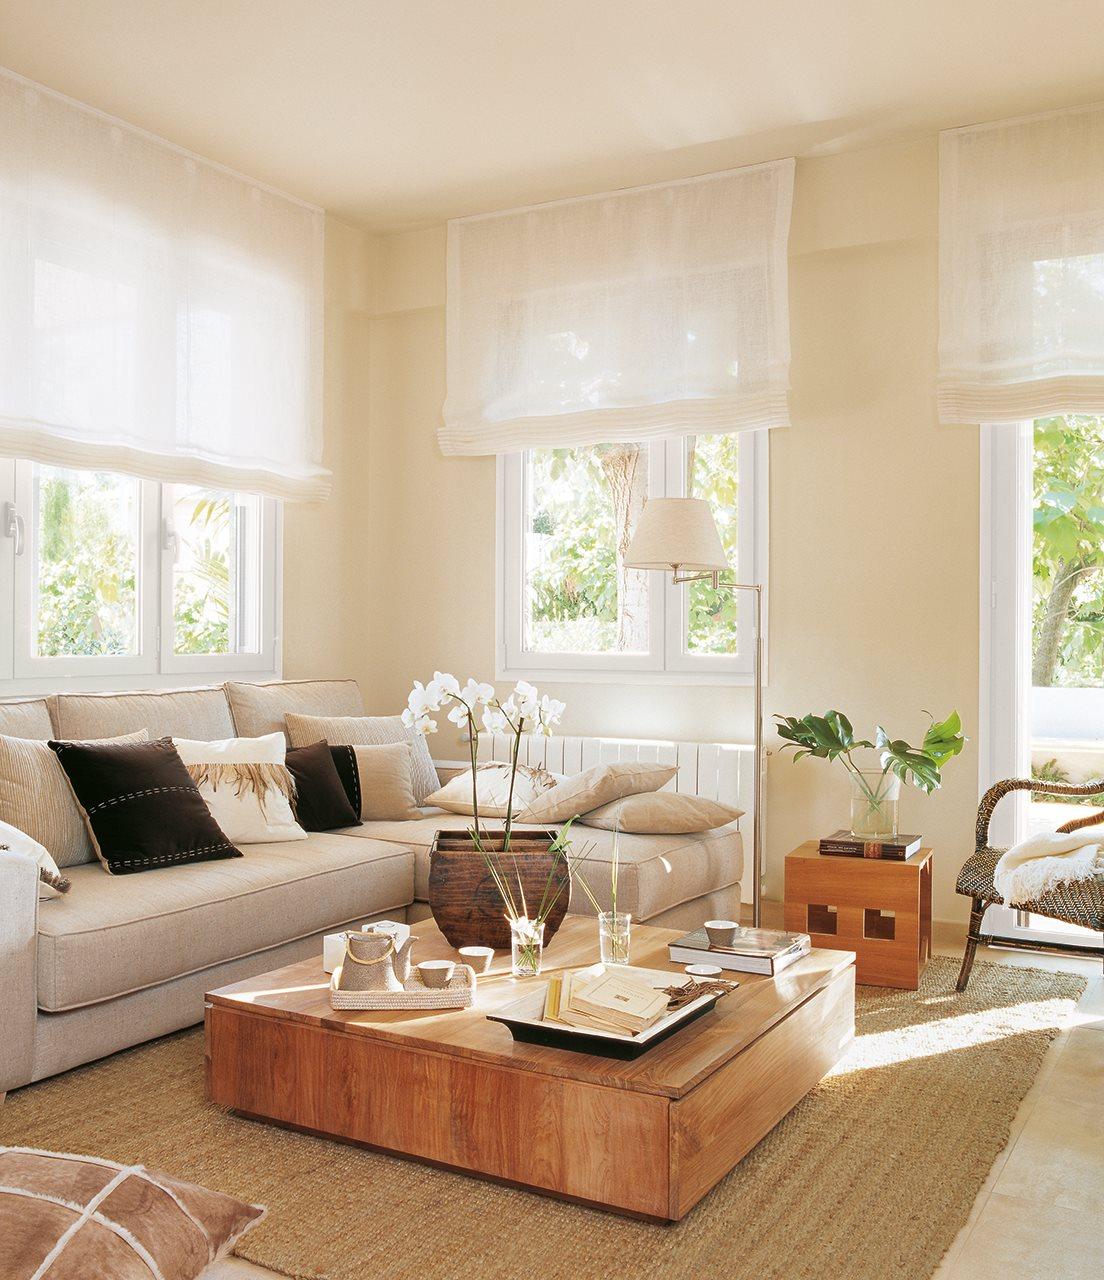 10 salones peque os muy bien decorados for Decoracion salones modernos pequenos